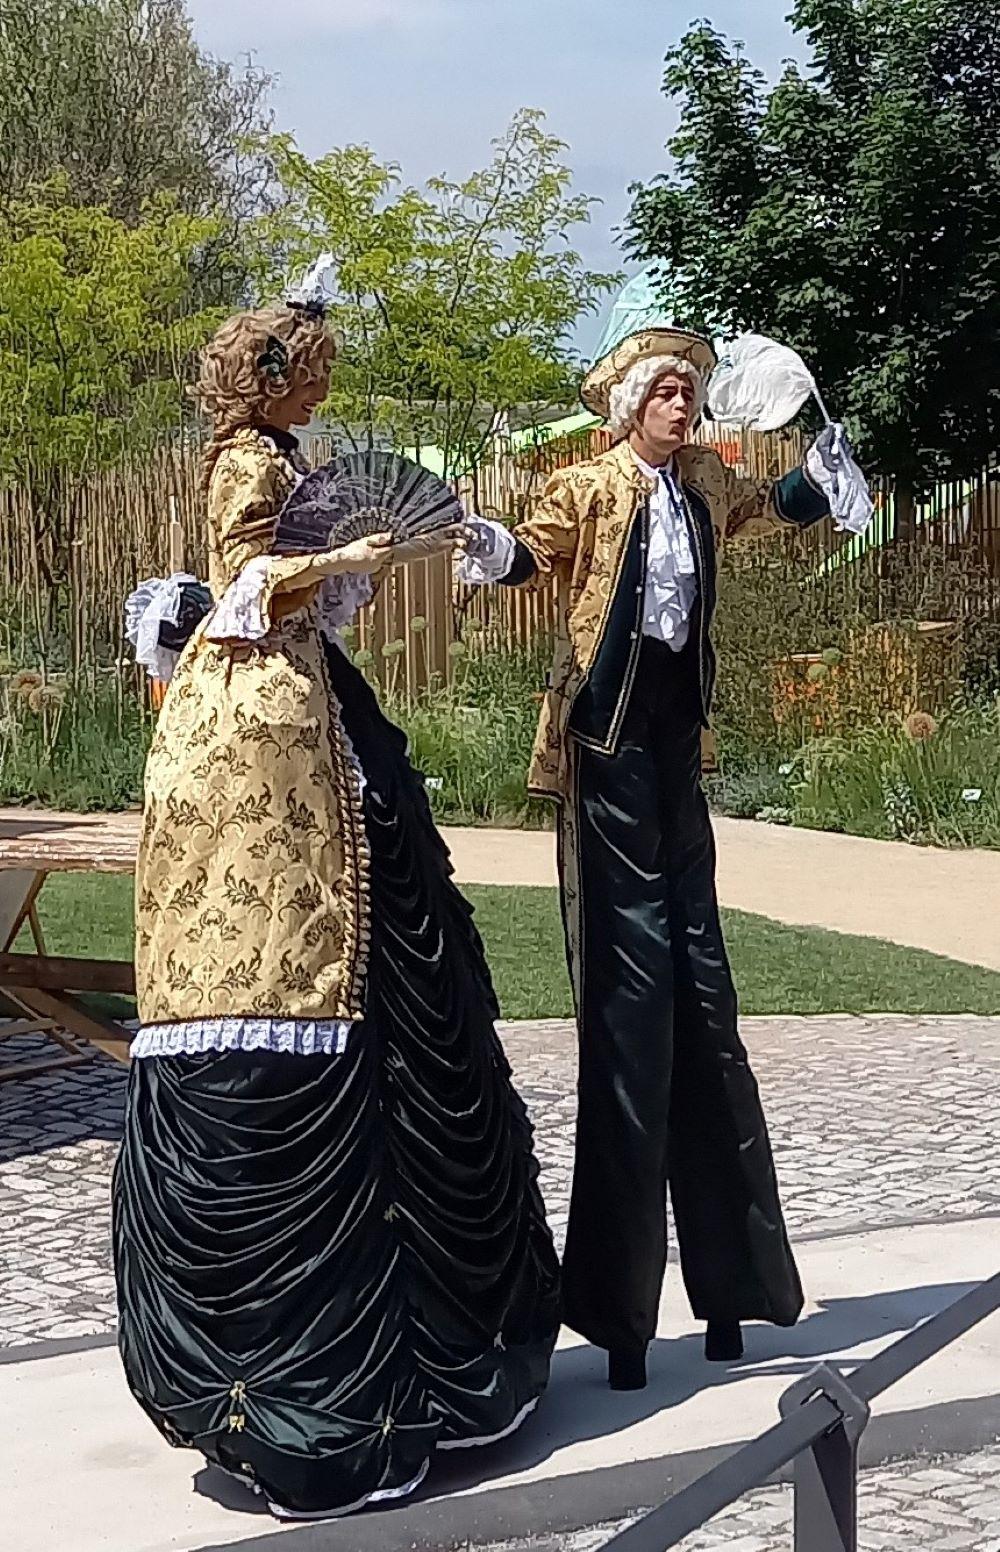 Stelzenläufer in Renaissance-Kostümen am Standort Petersberg